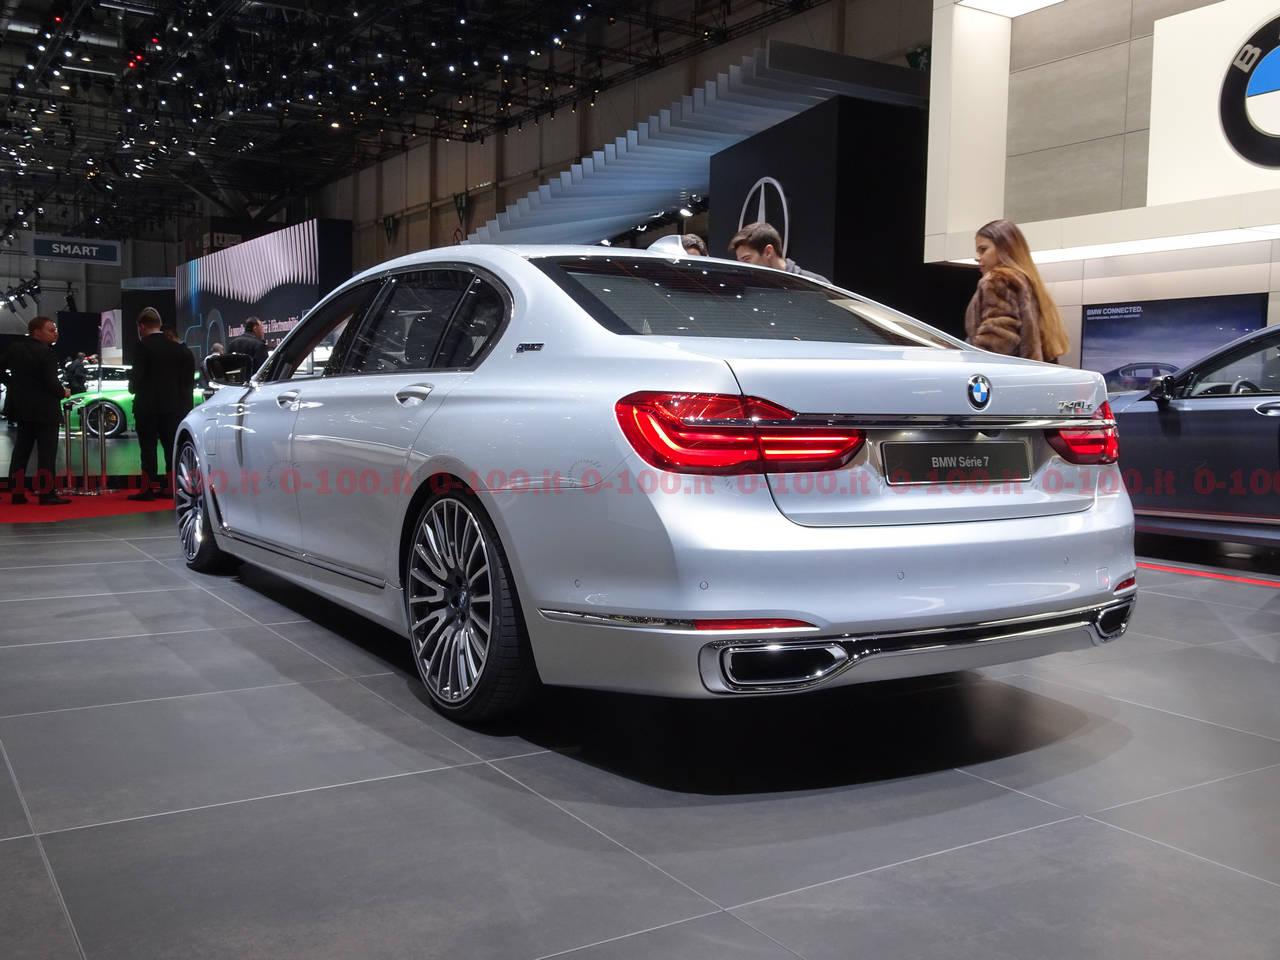 Ginevra-geneva-geneve-2017-BMW_Serie-7_0-100_7